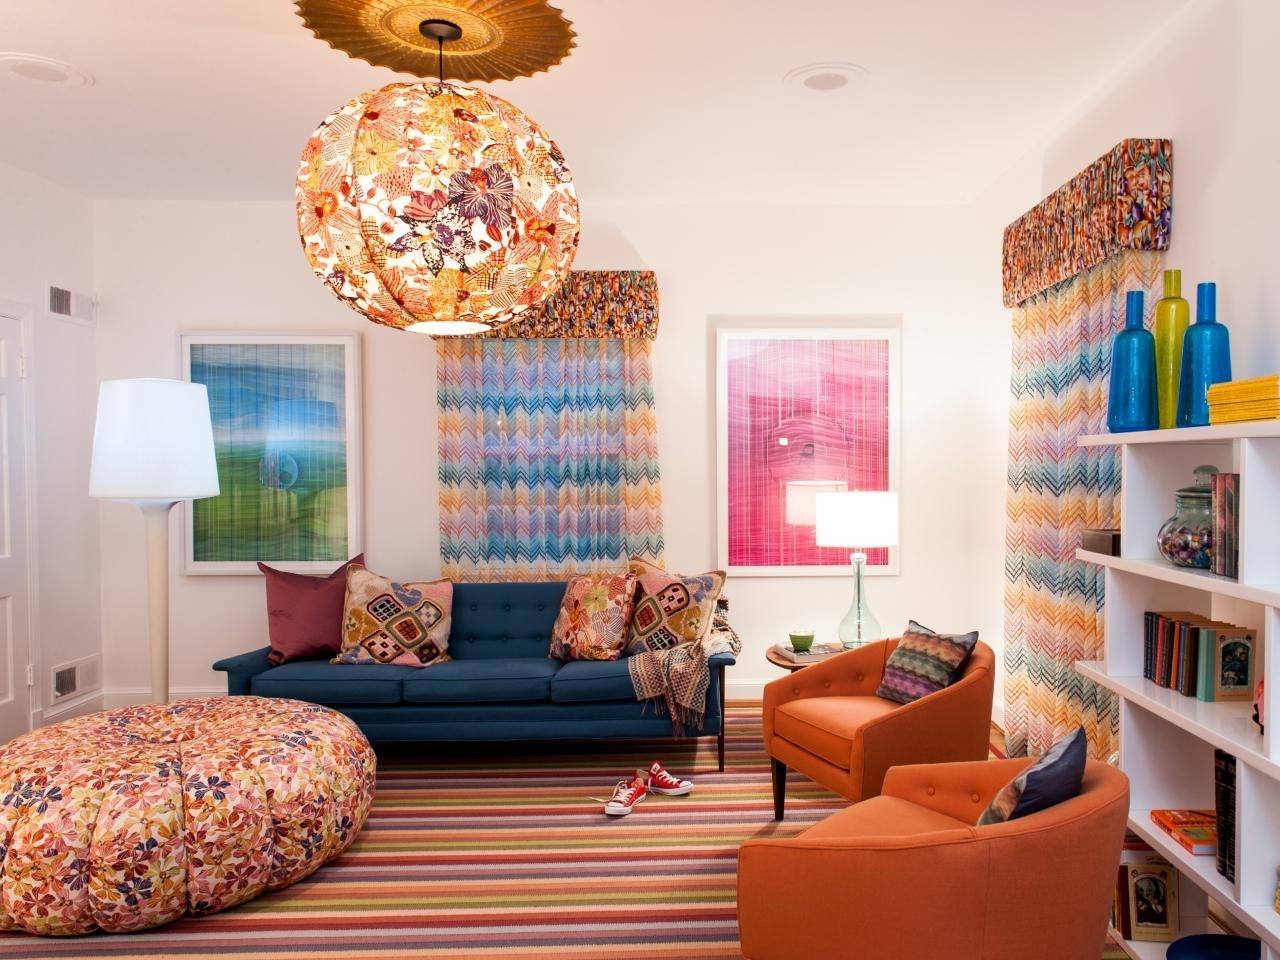 10 Amazing Teenage Bedroom Ideas For Girls %name